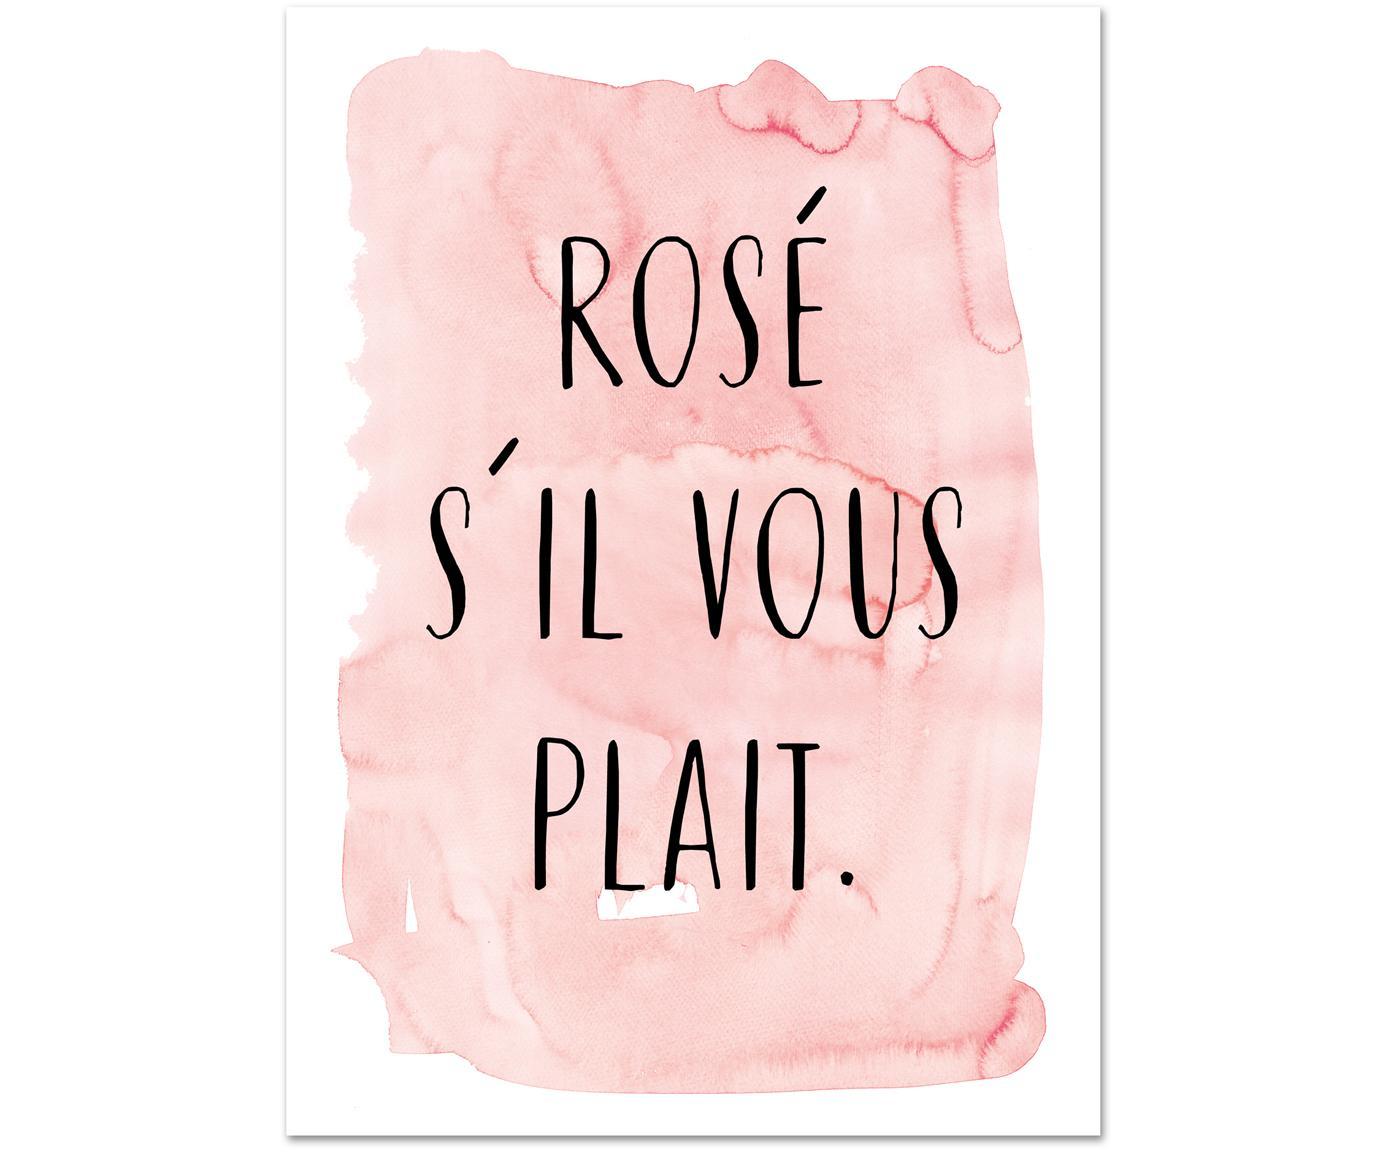 Poster S'il Vous Plait, Digitaldruck auf Papier, 200 g/m², Rosa, Schwarz, Weiß, 21 x 30 cm